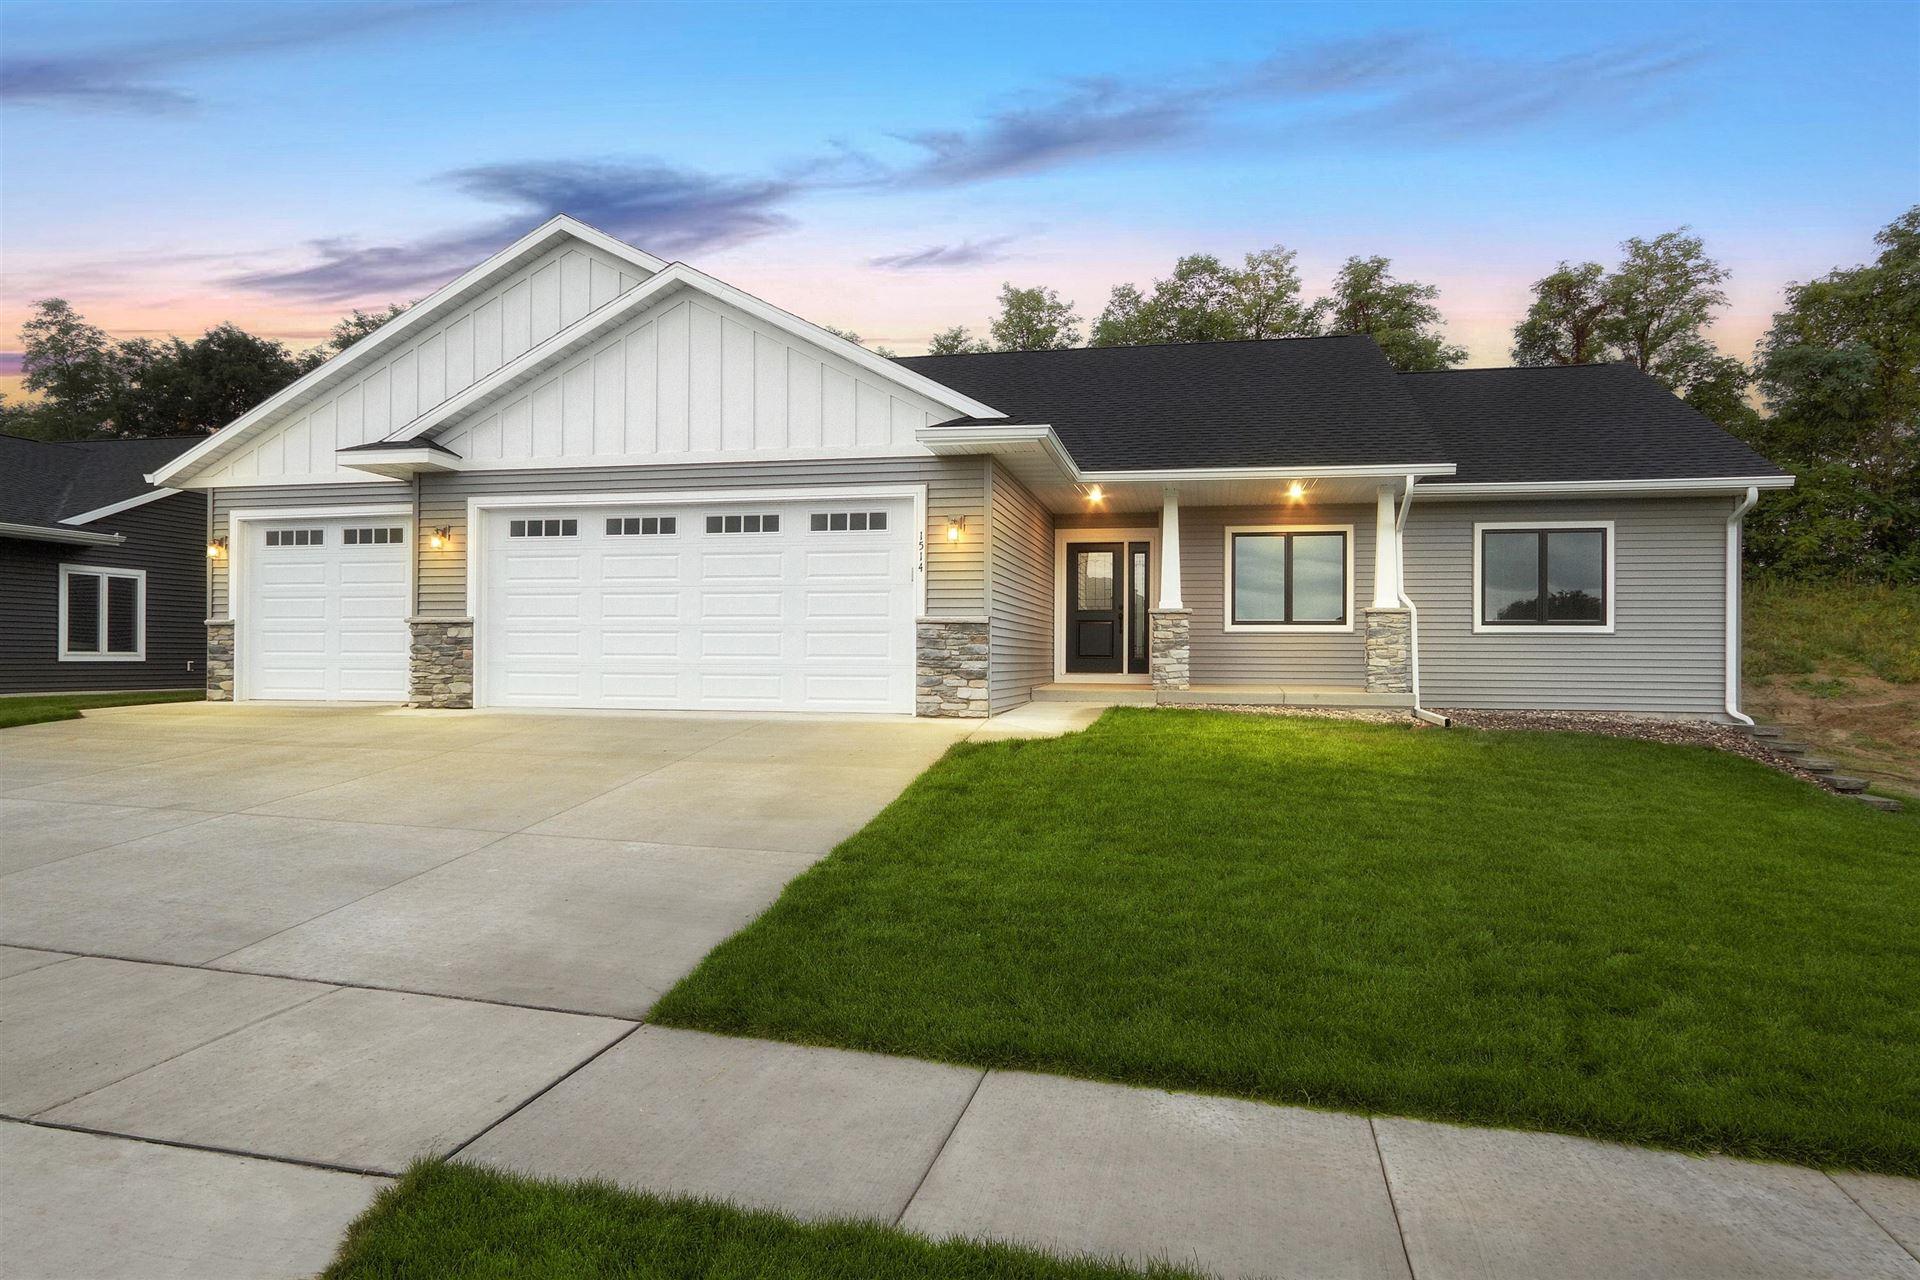 1514 Cherry Ln S, Holmen, WI 54636 - MLS#: 1704508